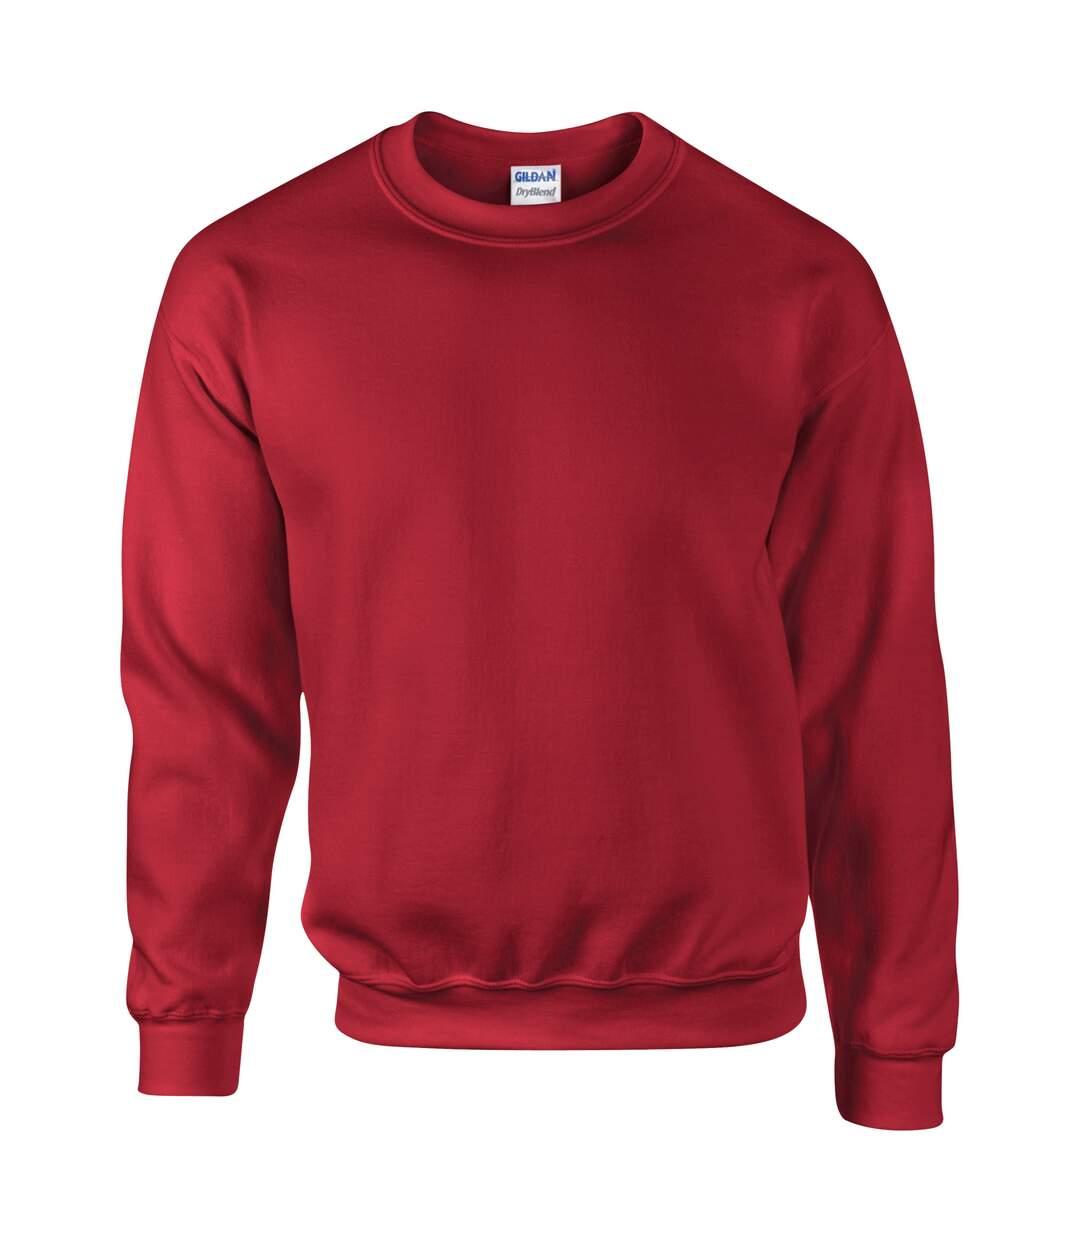 Gildan DryBlend Adult Set-In Crew Neck Sweatshirt (13 Colours) (White) - UTBC459